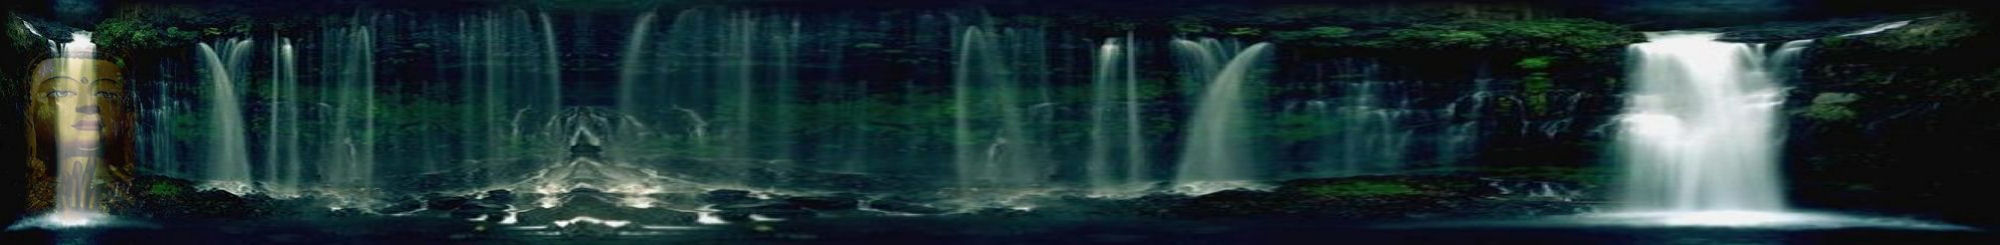 Fondo IM cascadas_noche_002.imf